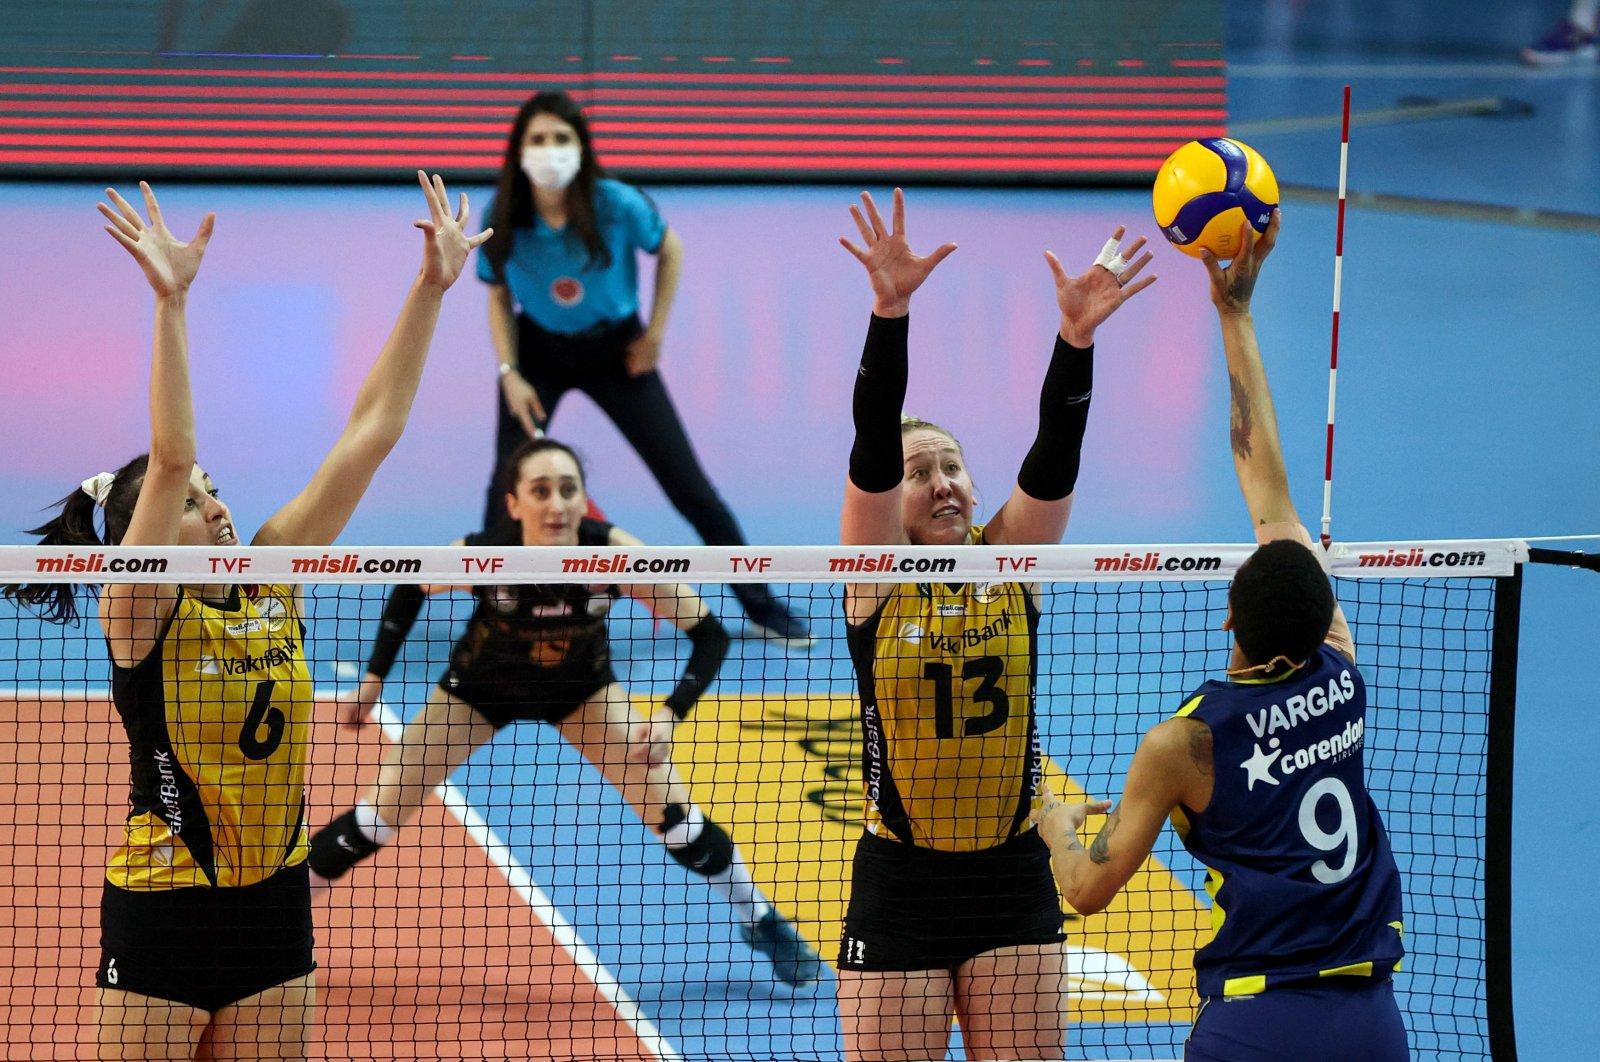 VakıfBank's Kübra Çalışkan (L, #6) and Mic Bartsch (2nd from R, #13) jump to make a play against Fenerbahçe Opet's Melissa Vargas (R, #9) during a Misli.com Sultans' League playoff game in Istanbul, Turkey, April 13, 2021. (AA Photo)